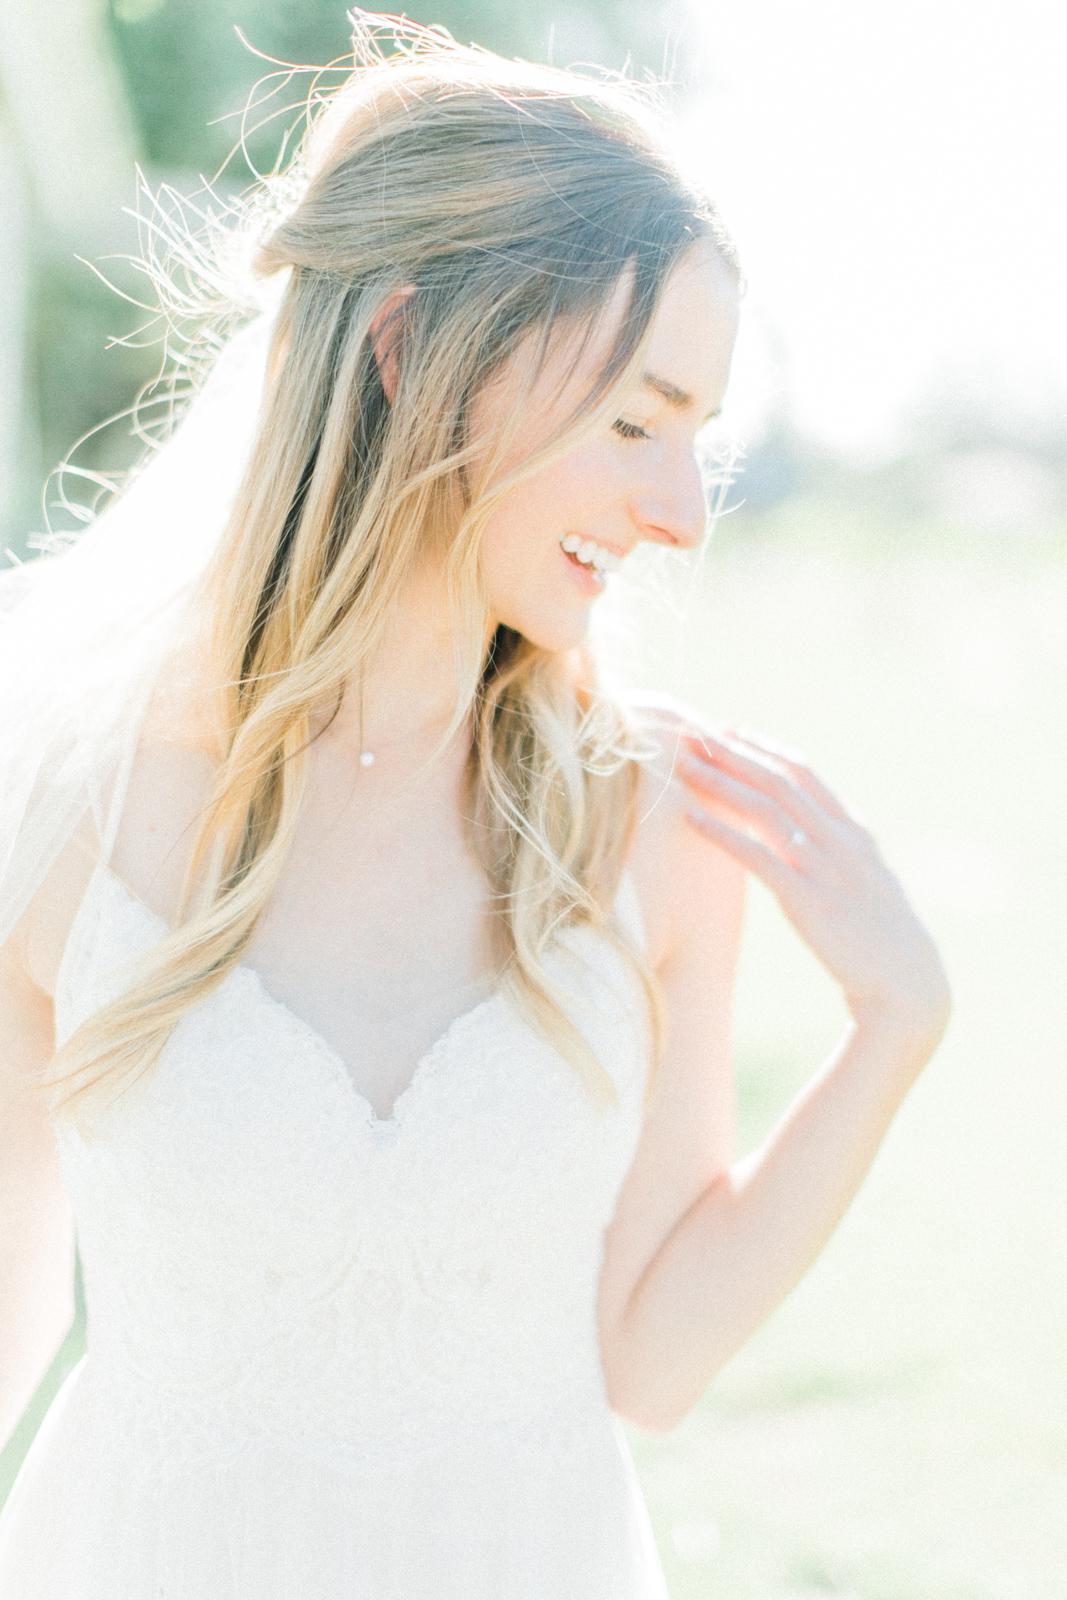 boise-idaho-elopement-engagement-photographer-9355.jpg